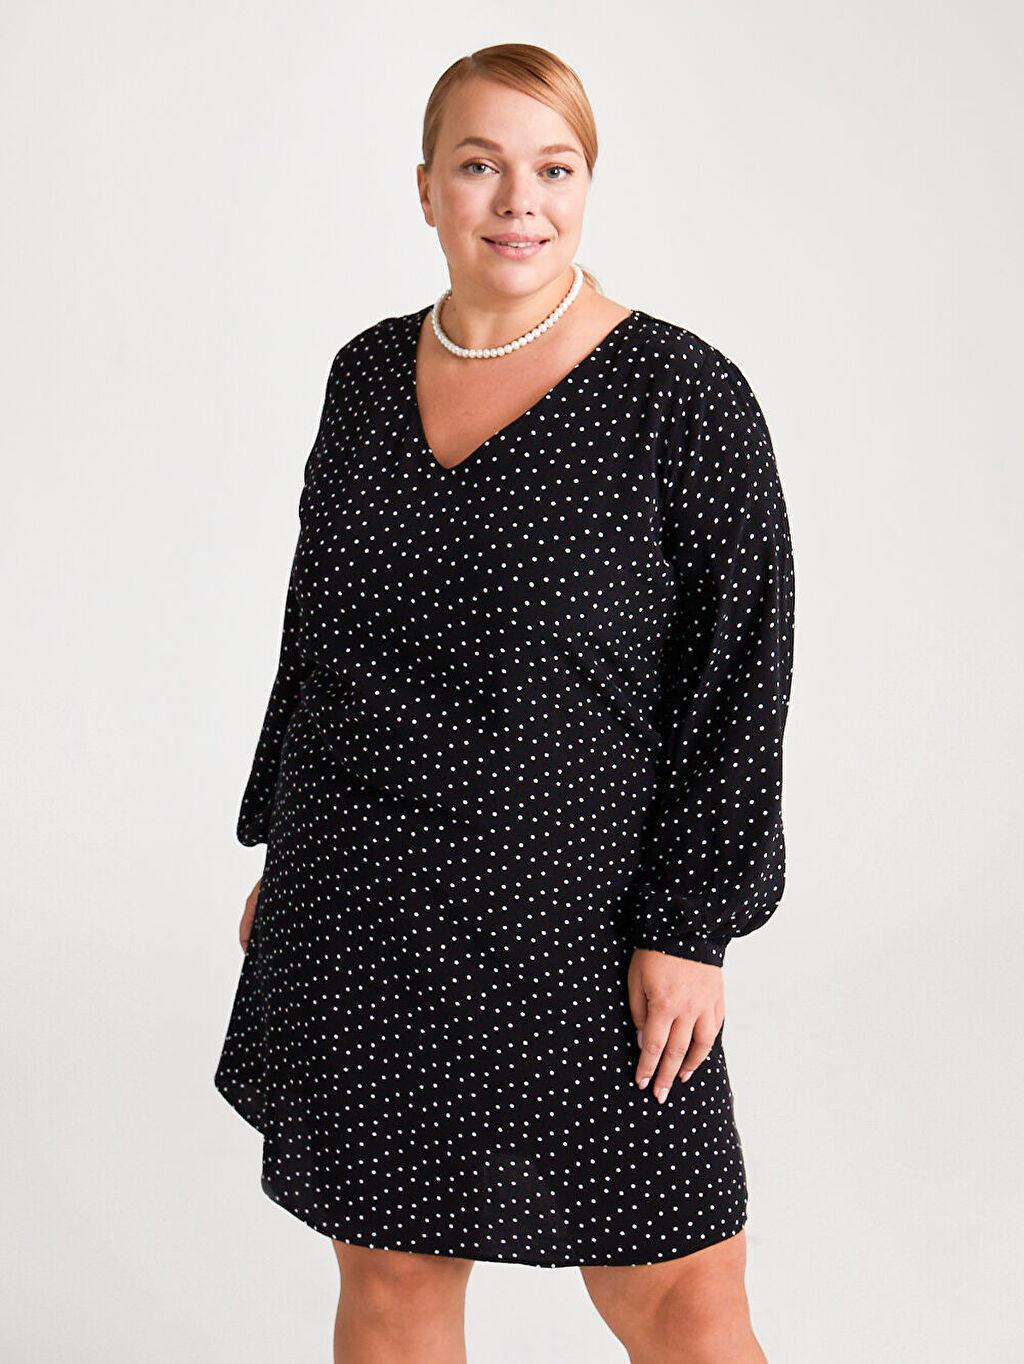 %100 Viskoz Elbise Desenli Krep Standart V Yaka Uzun Kol V Yaka Krep Elbise